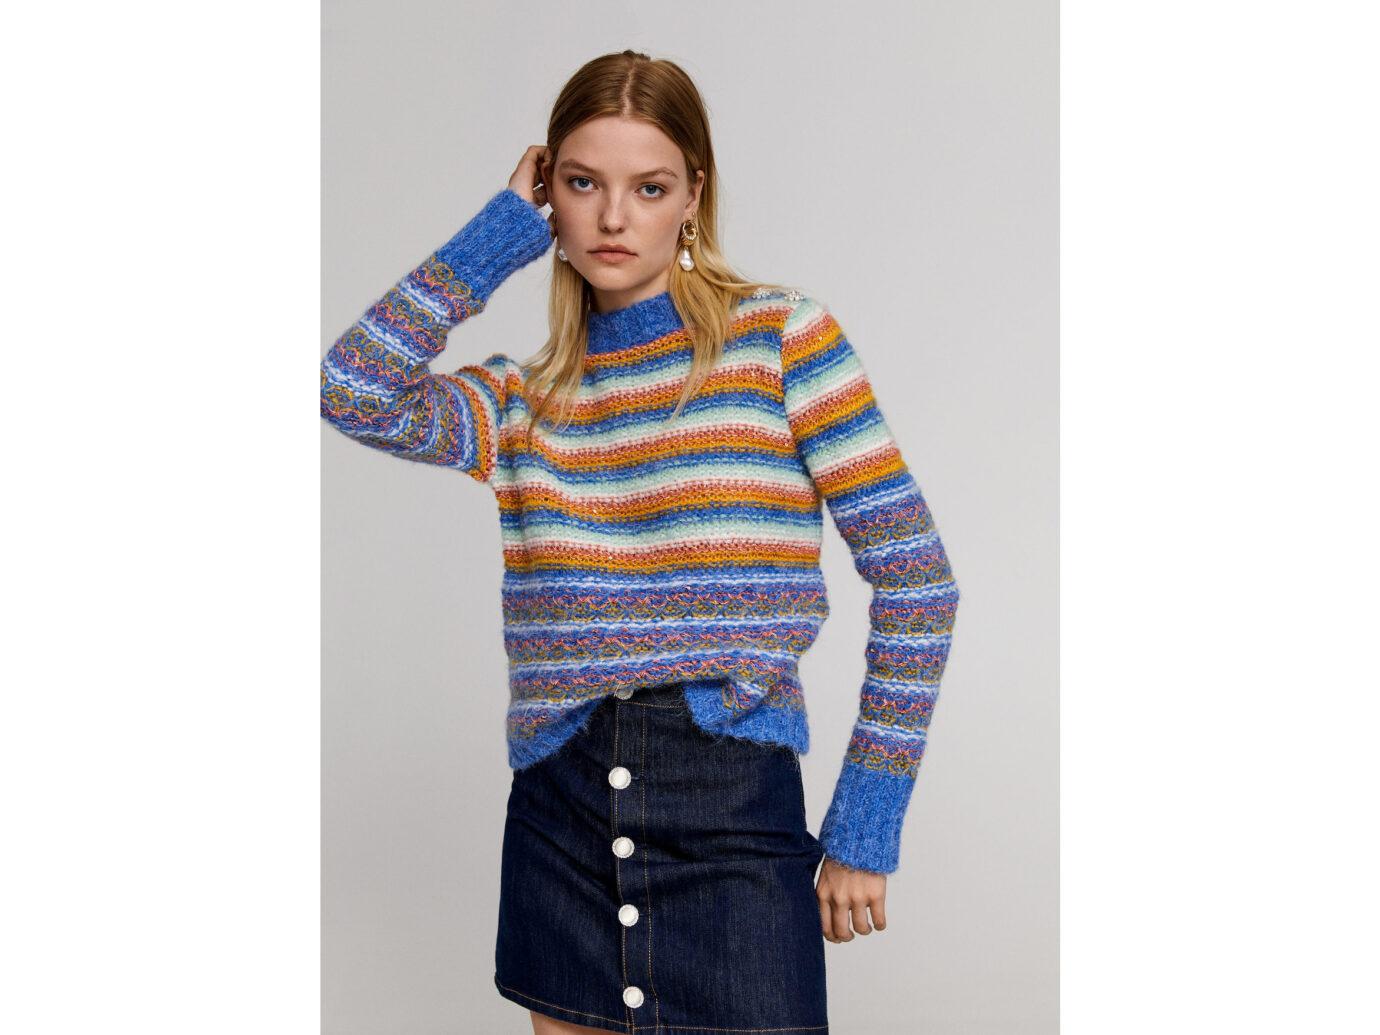 Beads striped sweater